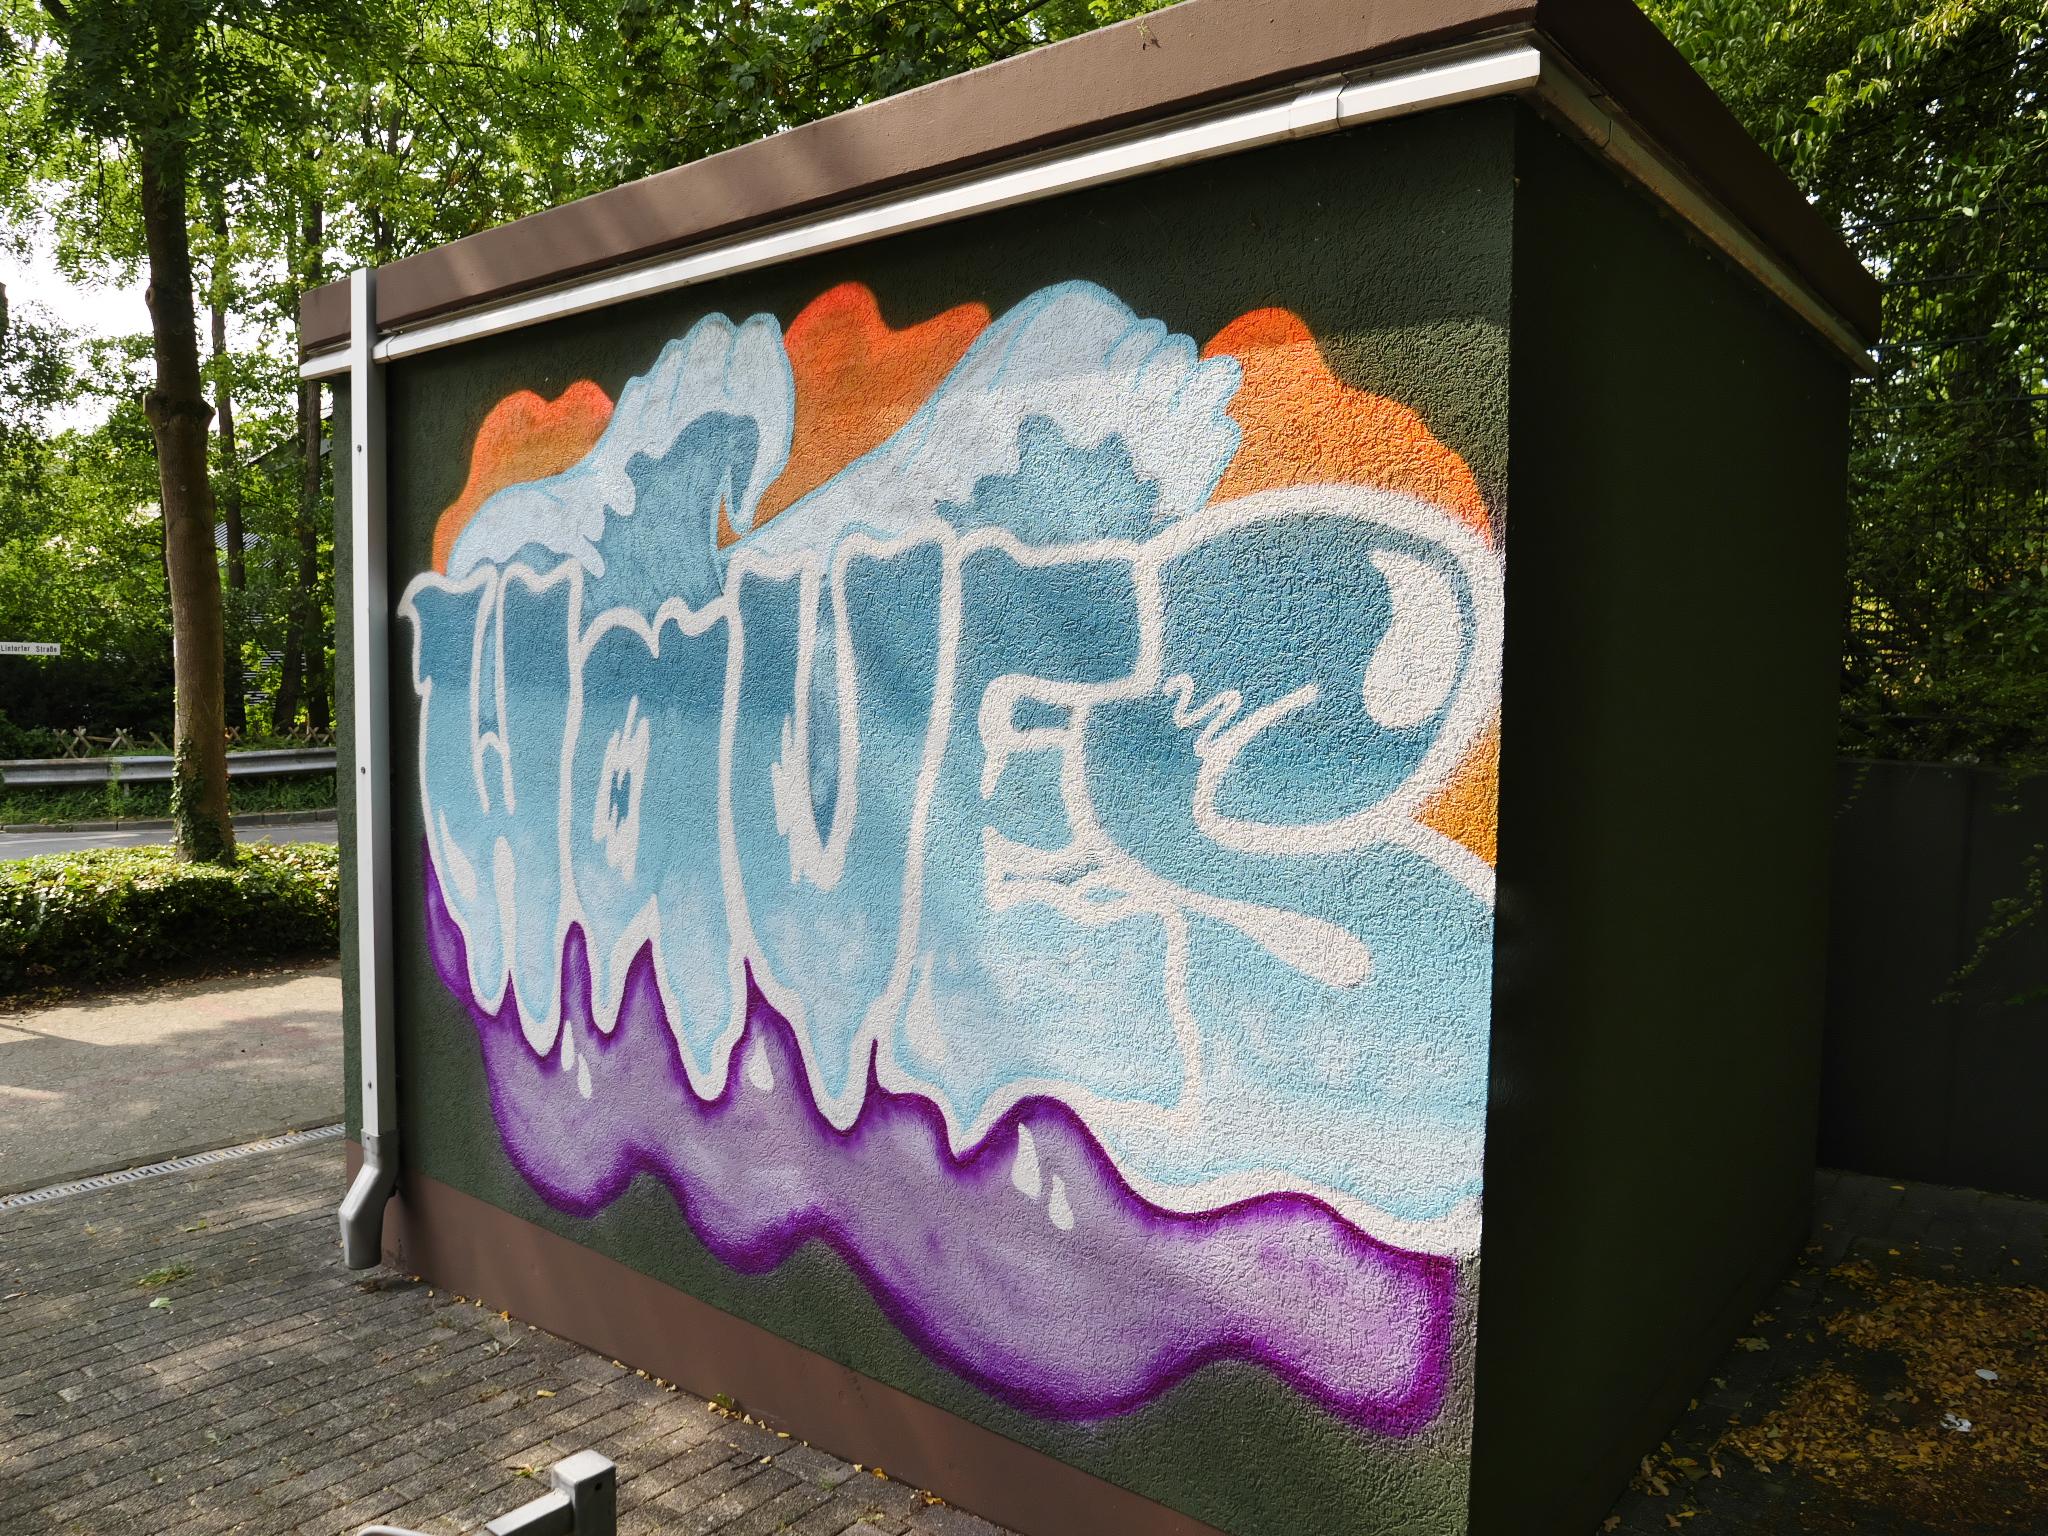 jugendkulturjahr-2020-ratingen-jkj2020-graffiti-trafohaeuschen-stadtwerke-Bild28